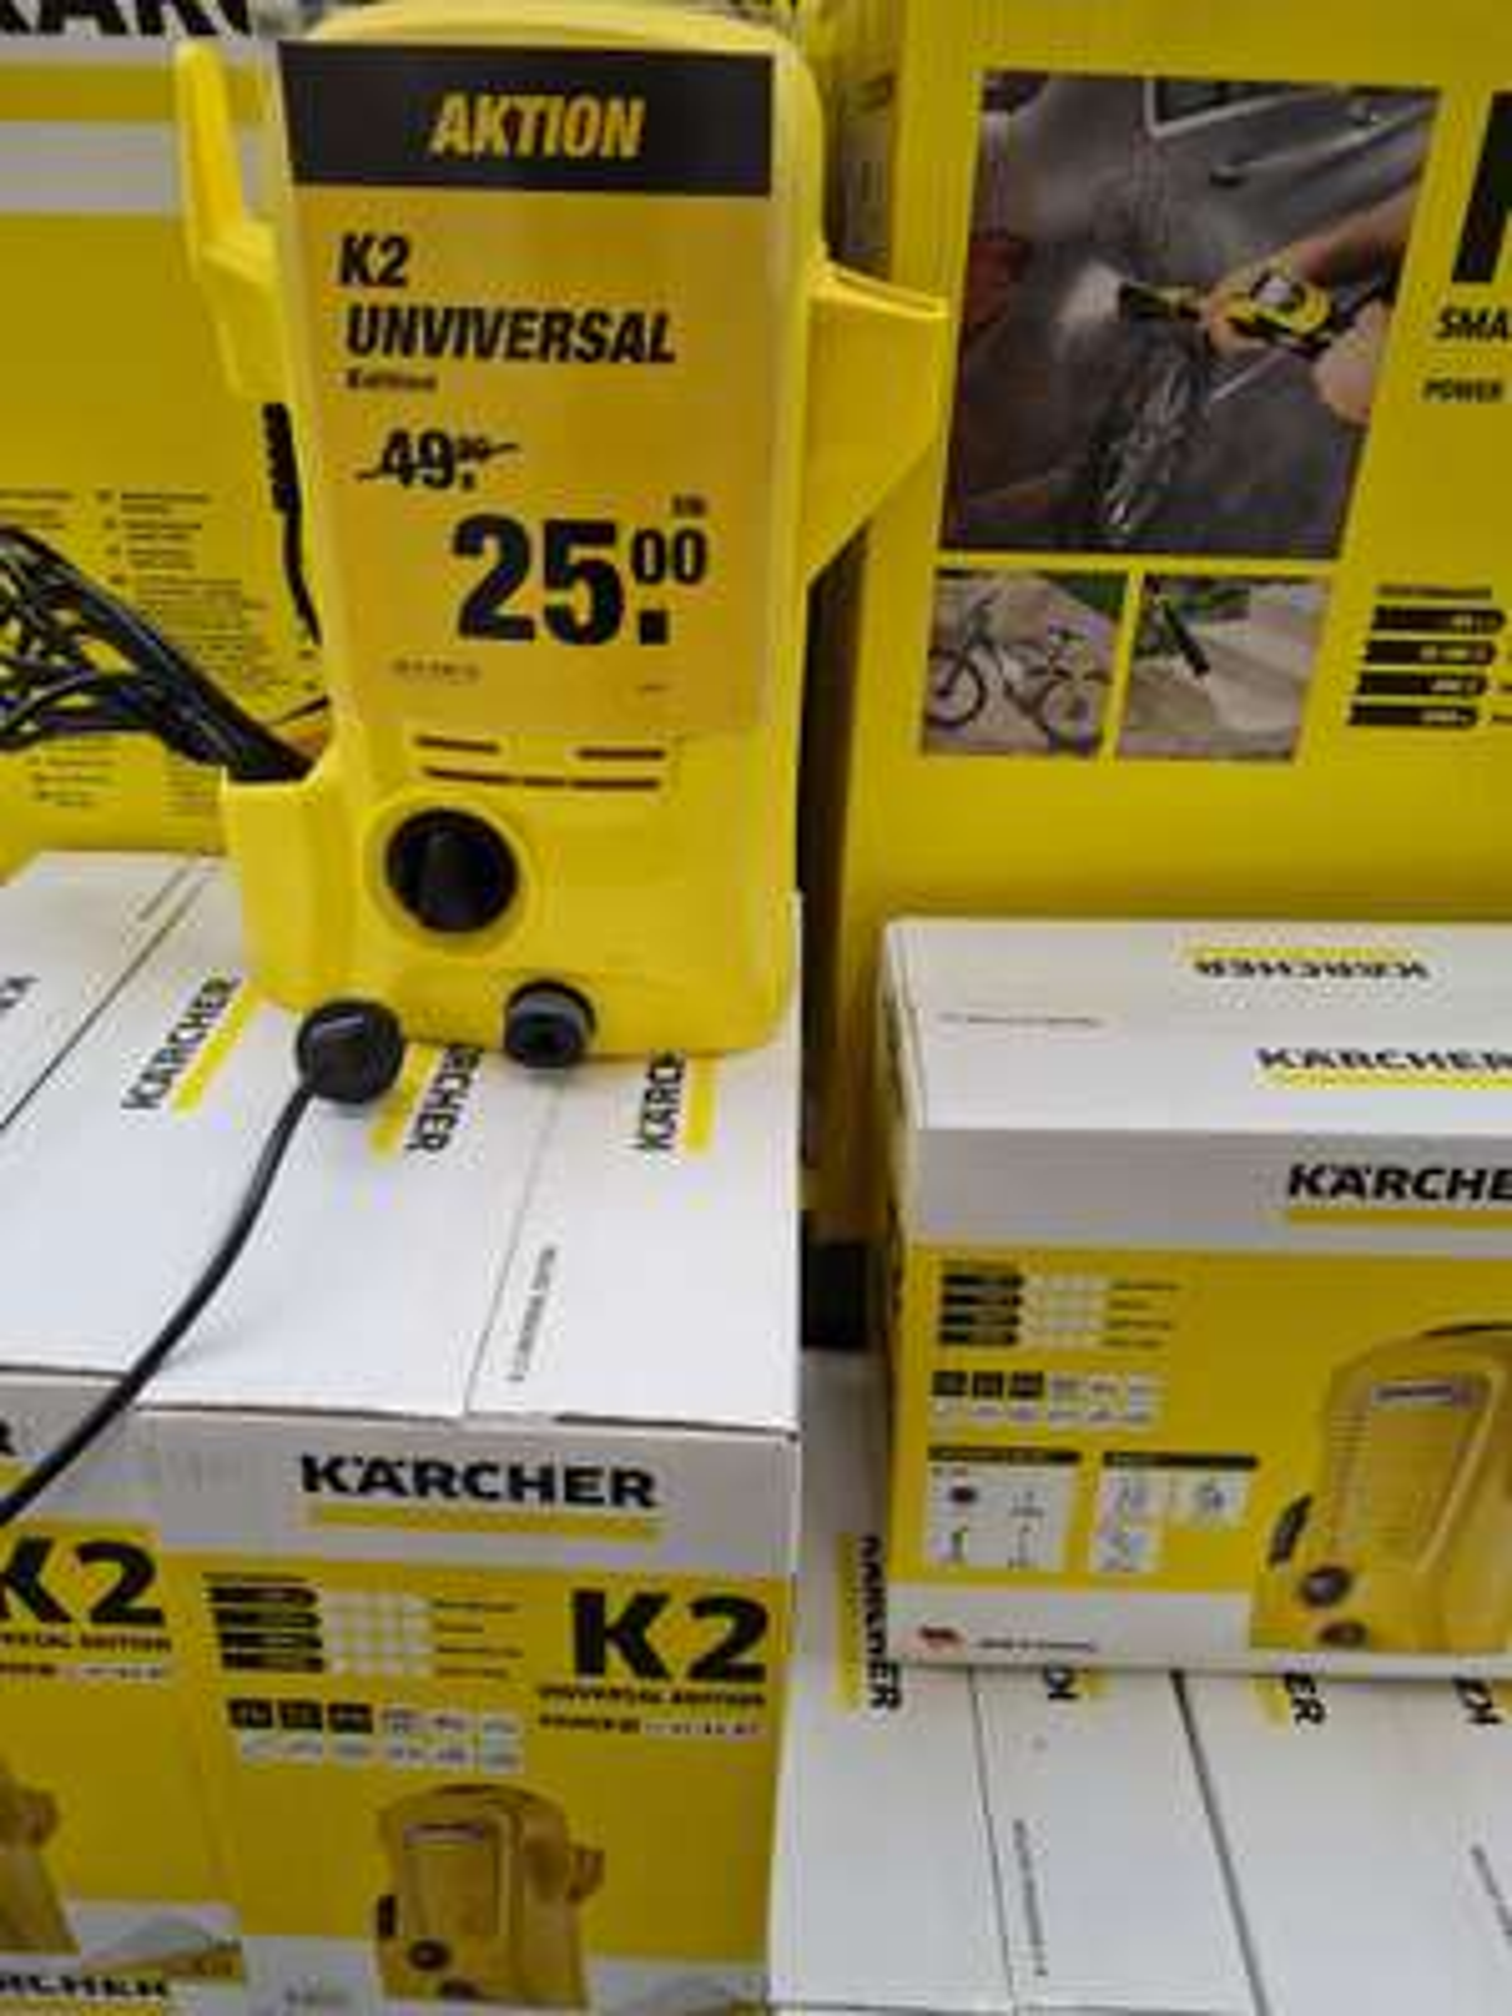 Kärcher K2 universal edition (lokal Lengerich)